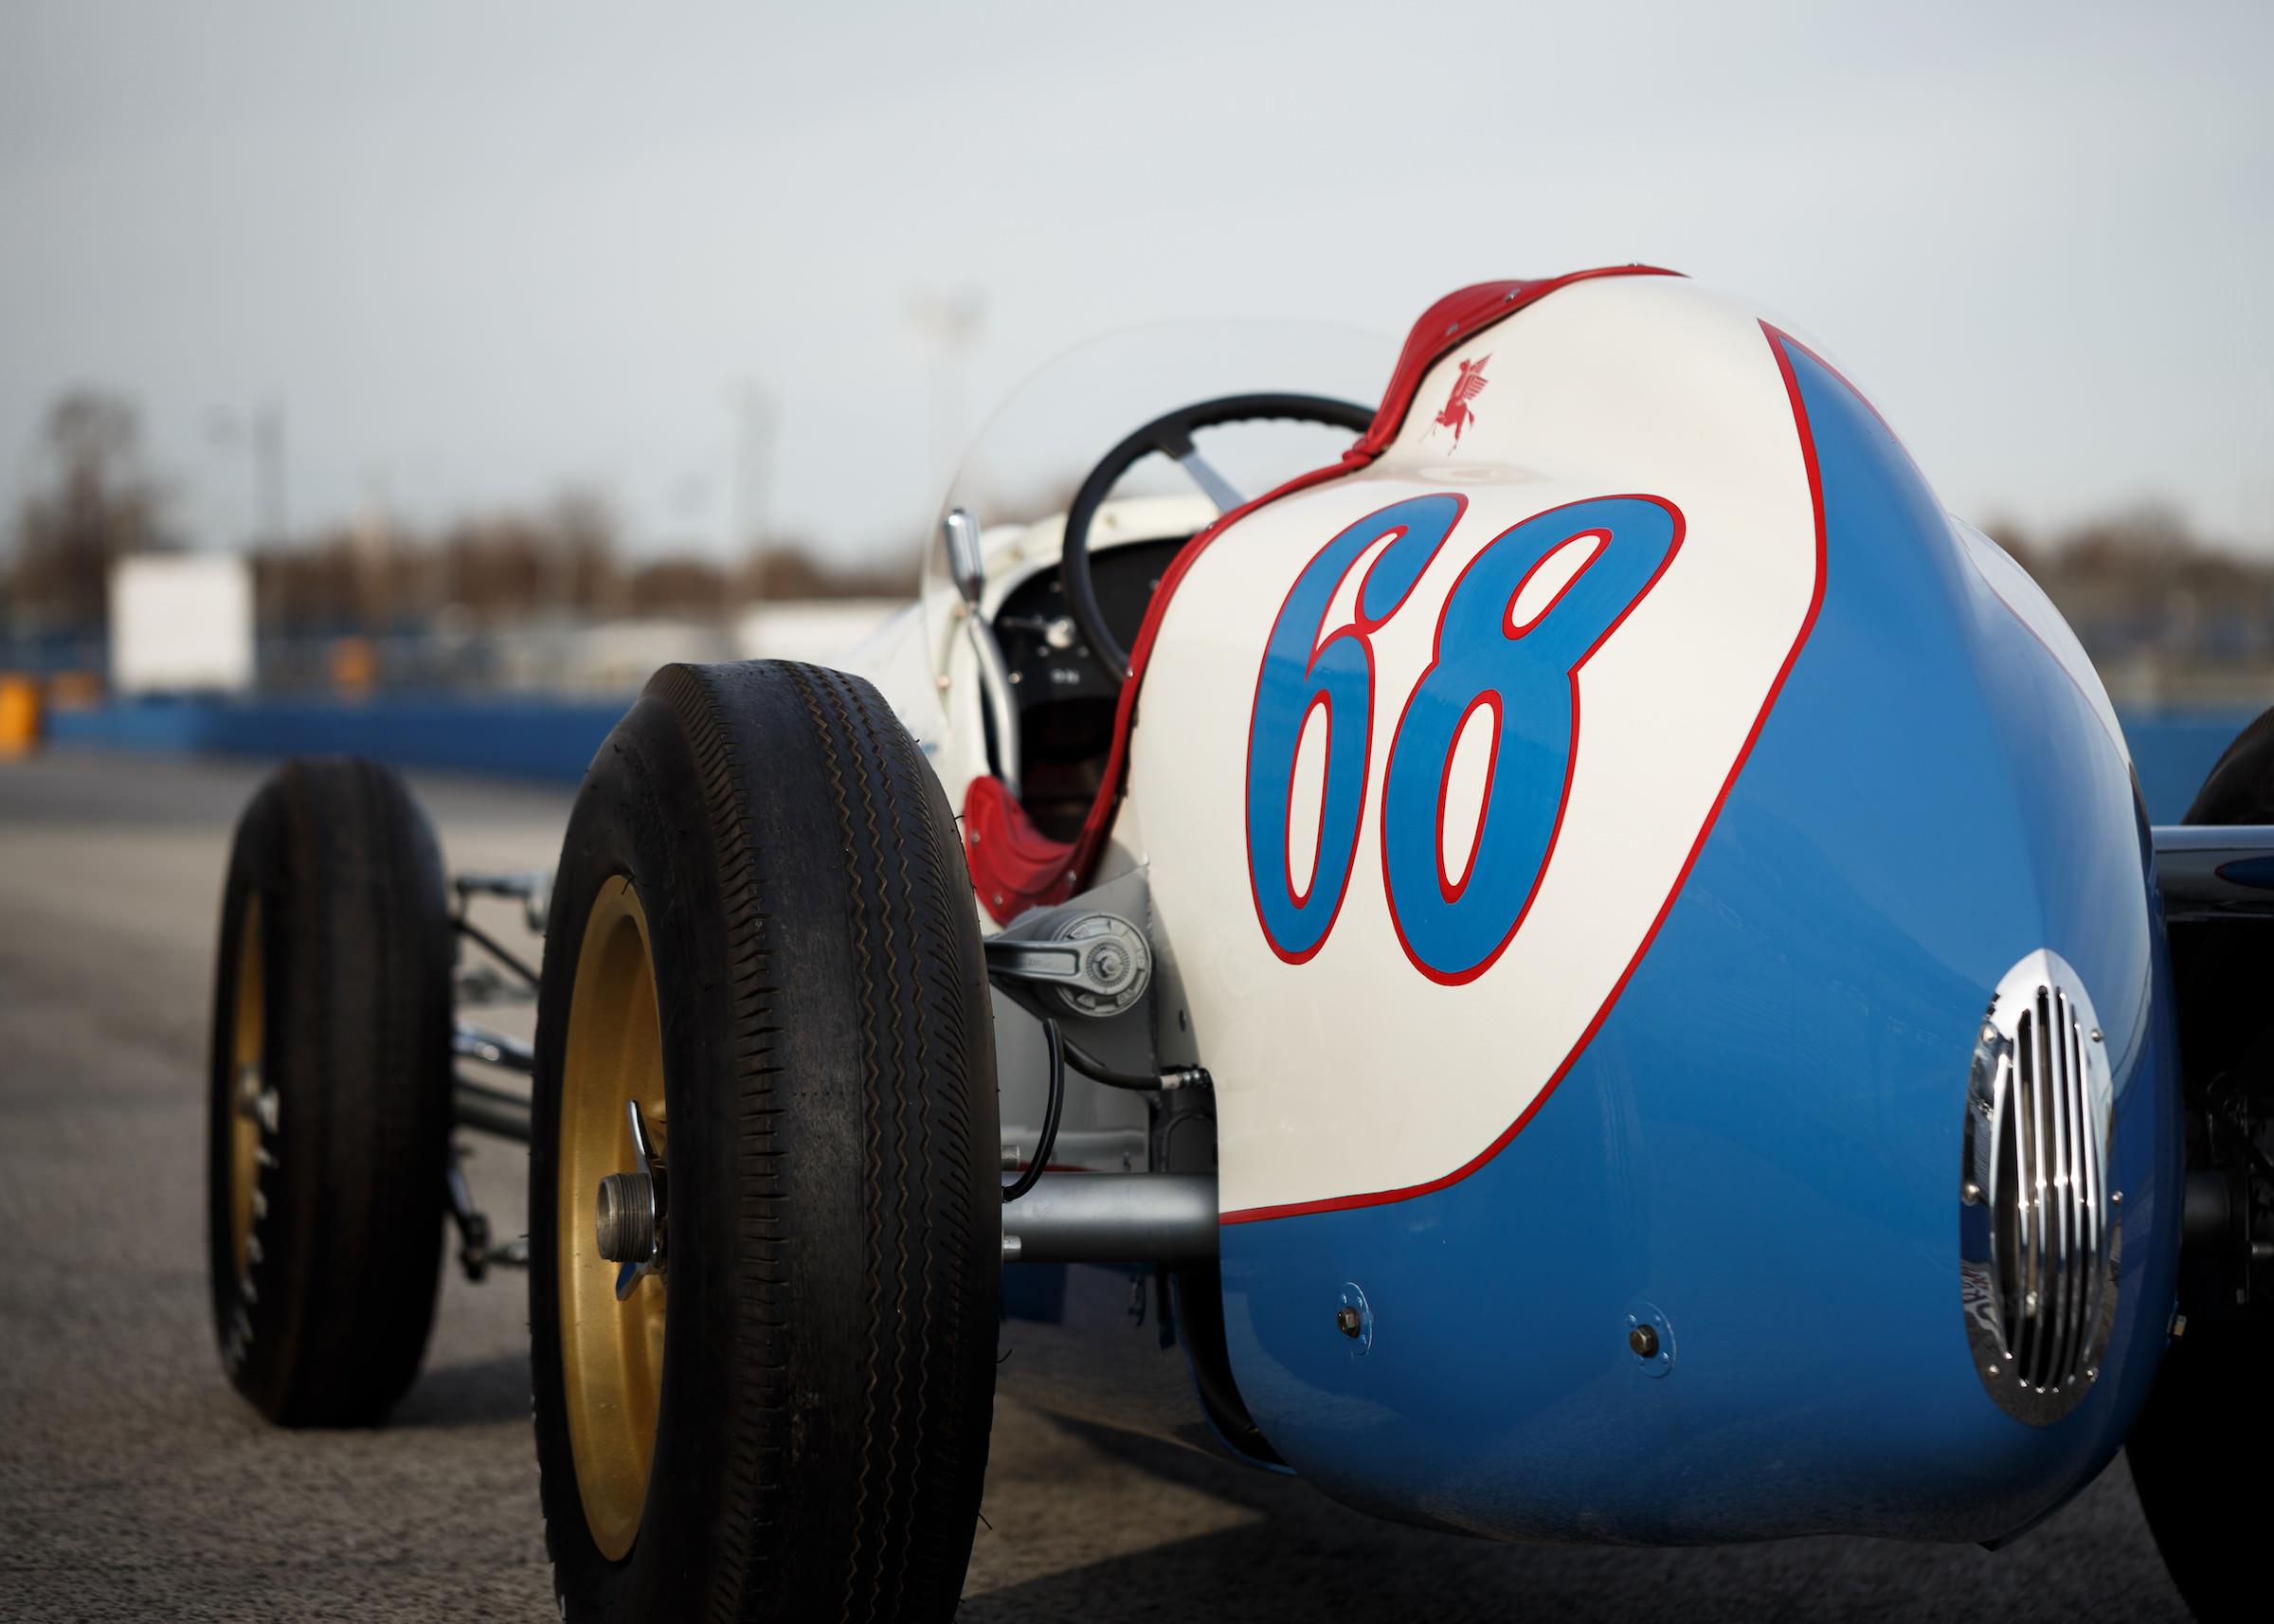 Kurtis KK4000 Offy Indy Race Car Back